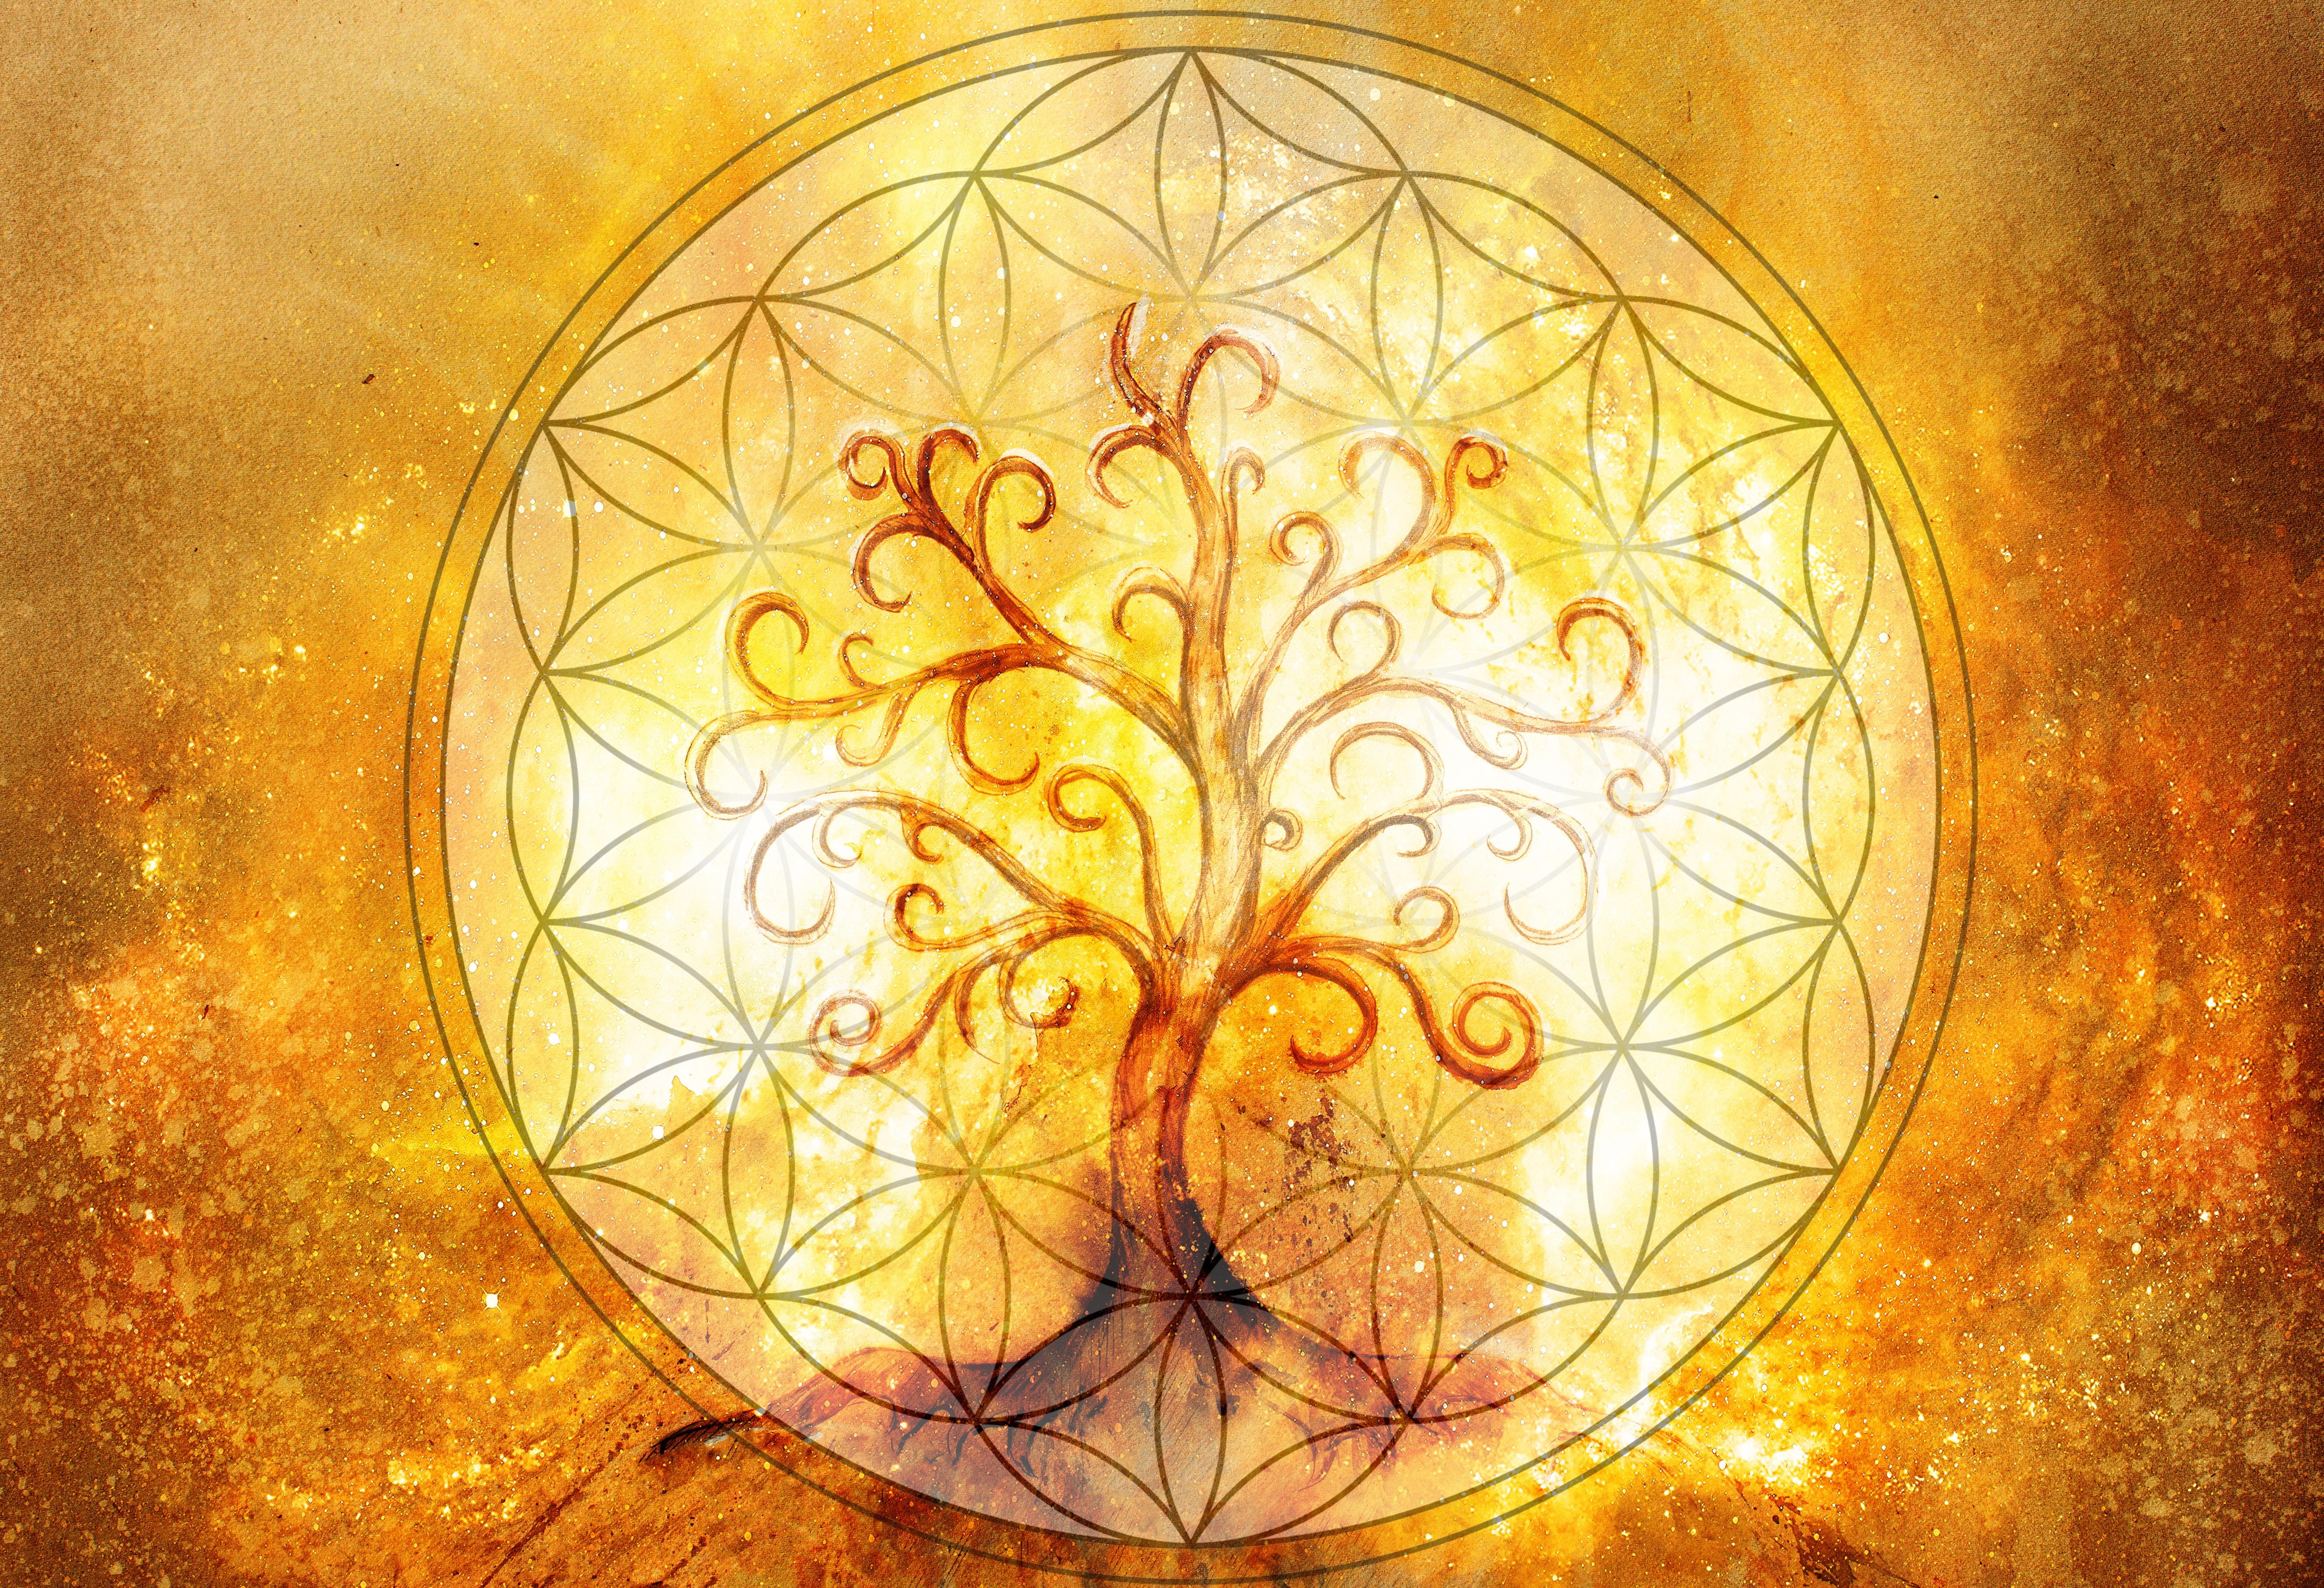 Tagesenergie heute 13. September 2021 - Blume des Lebens